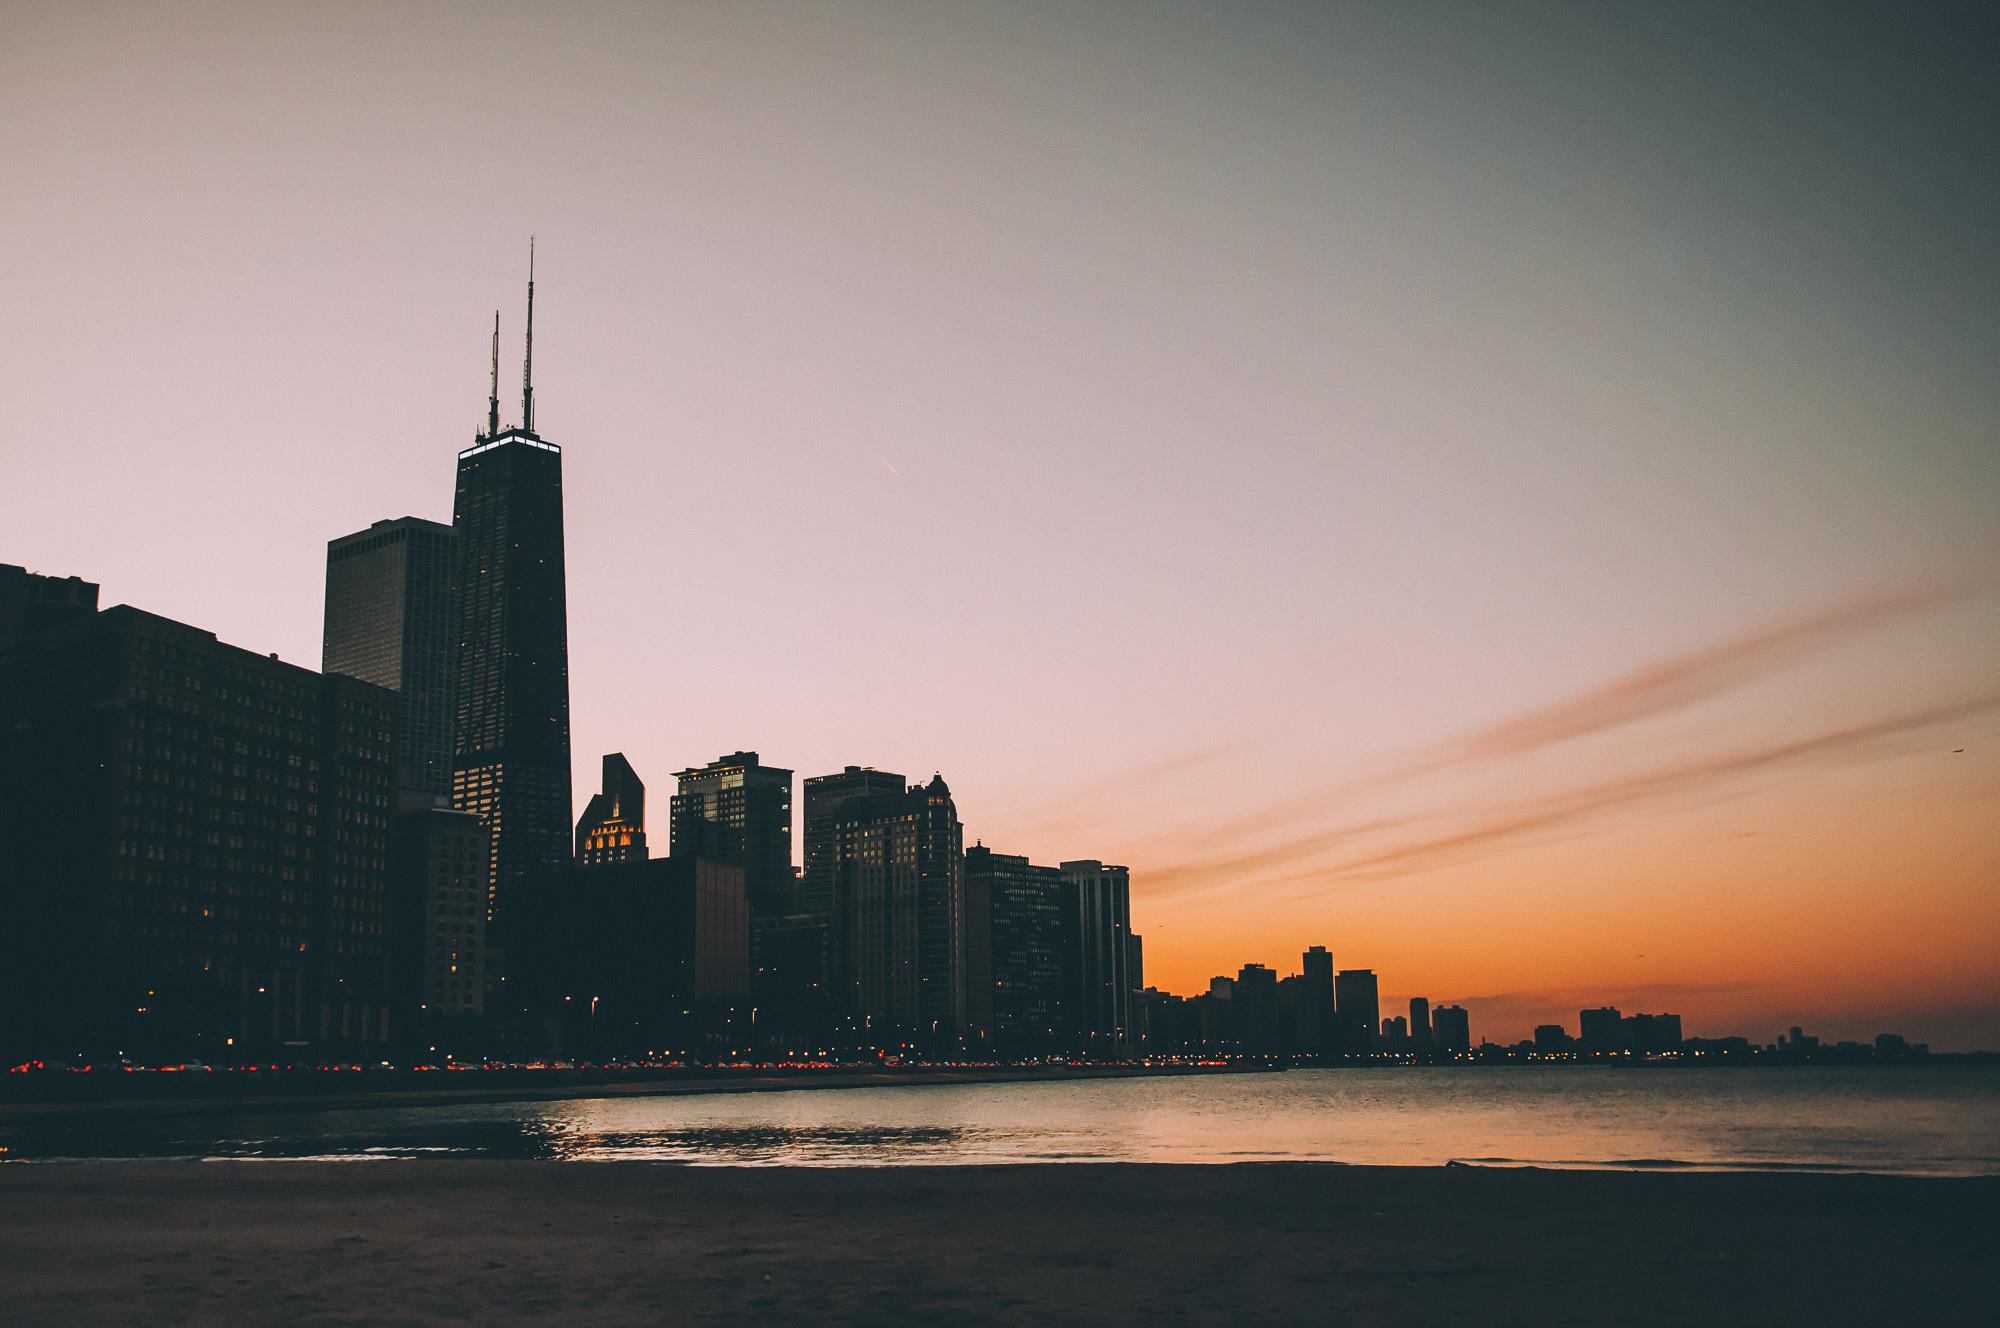 chicago-oak-street-beach